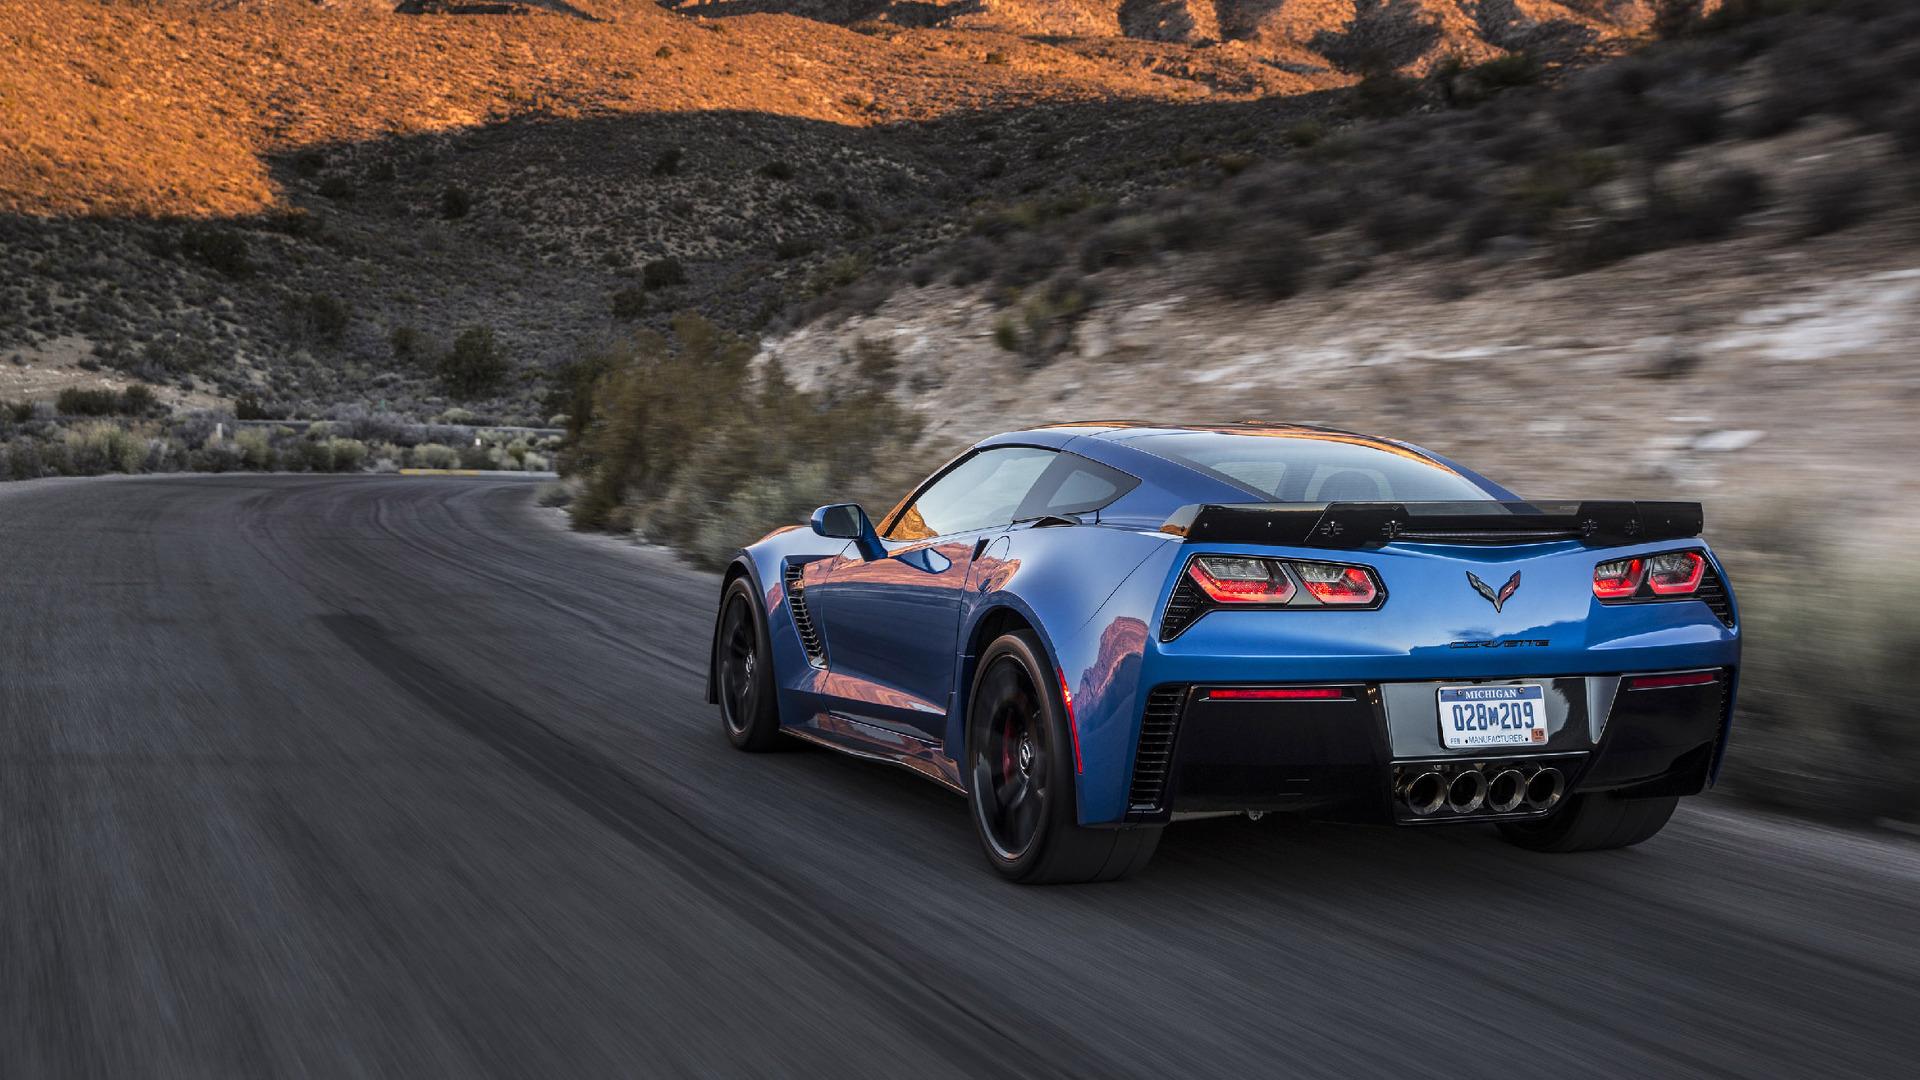 2017 Chevrolet Corvette Z06 to get cooling improvements